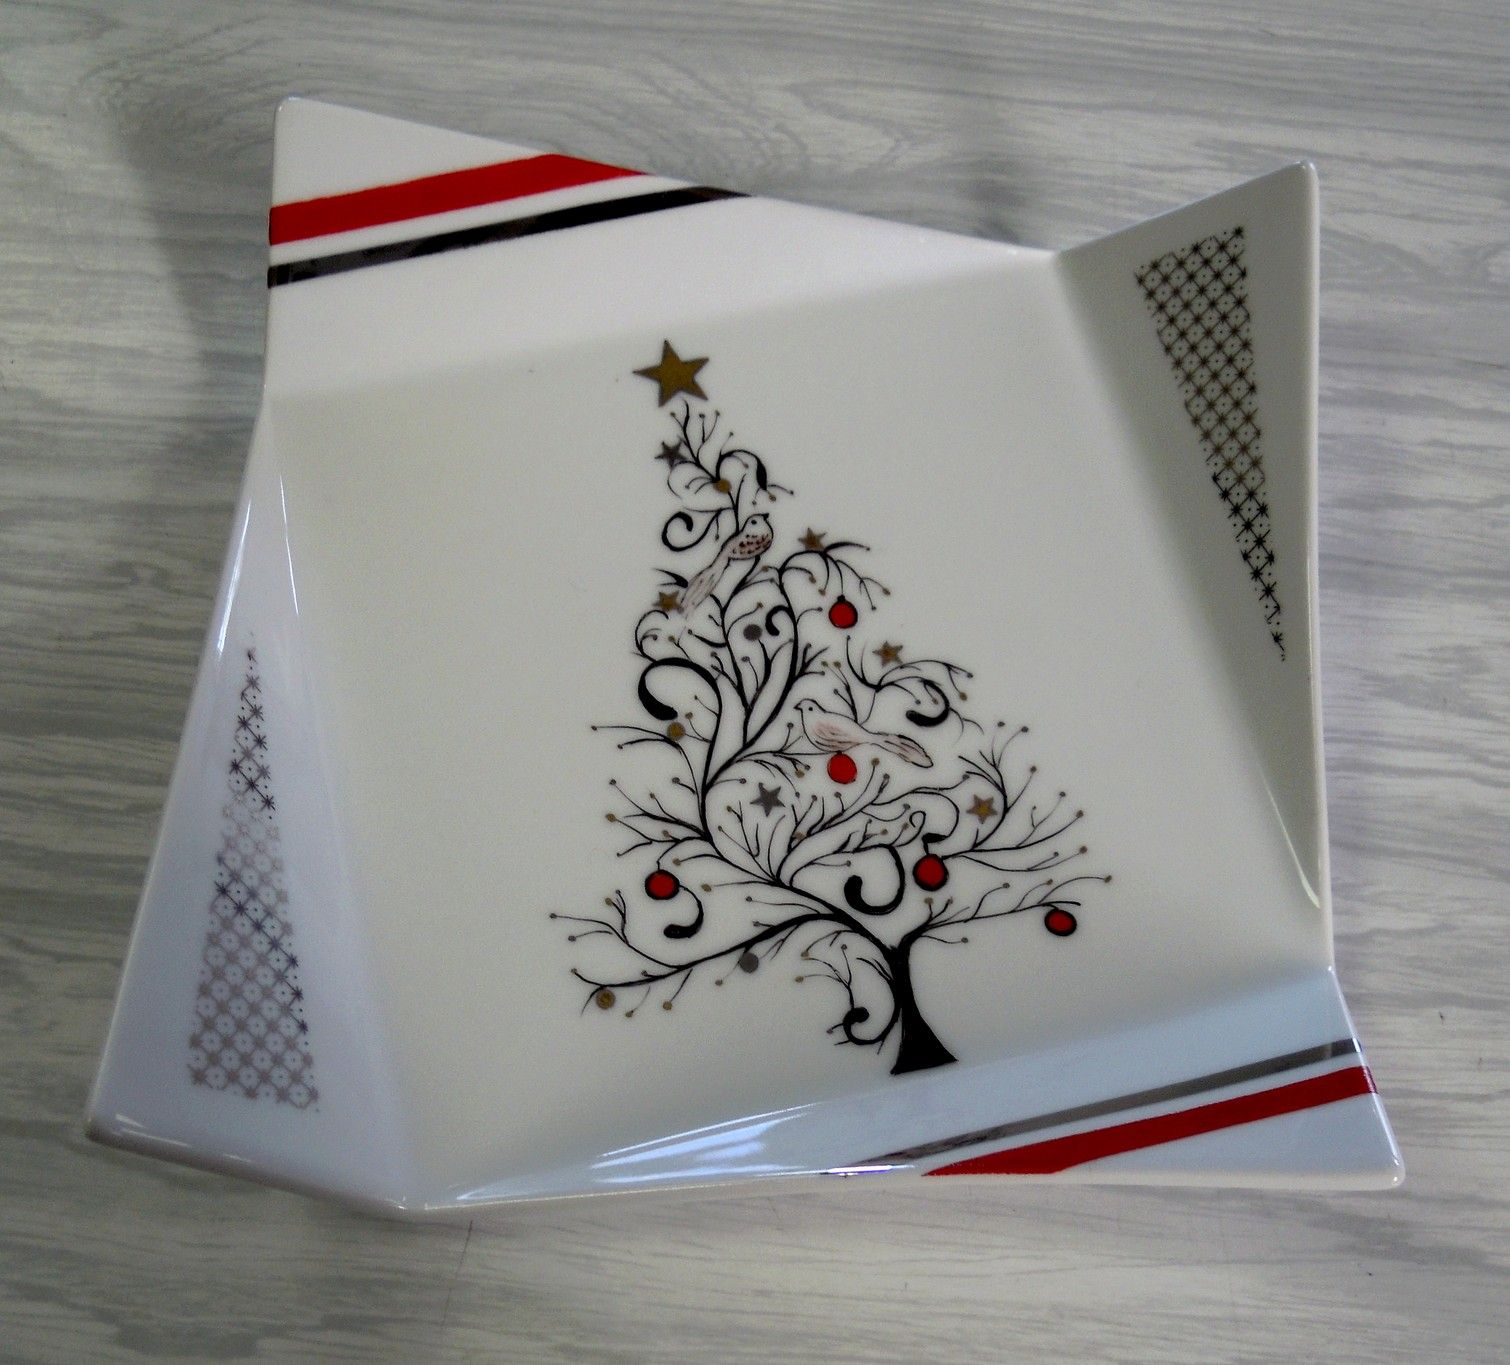 alacroiseedesaberslannilis e medias images porcelaine 10 12 15 christmas. Black Bedroom Furniture Sets. Home Design Ideas